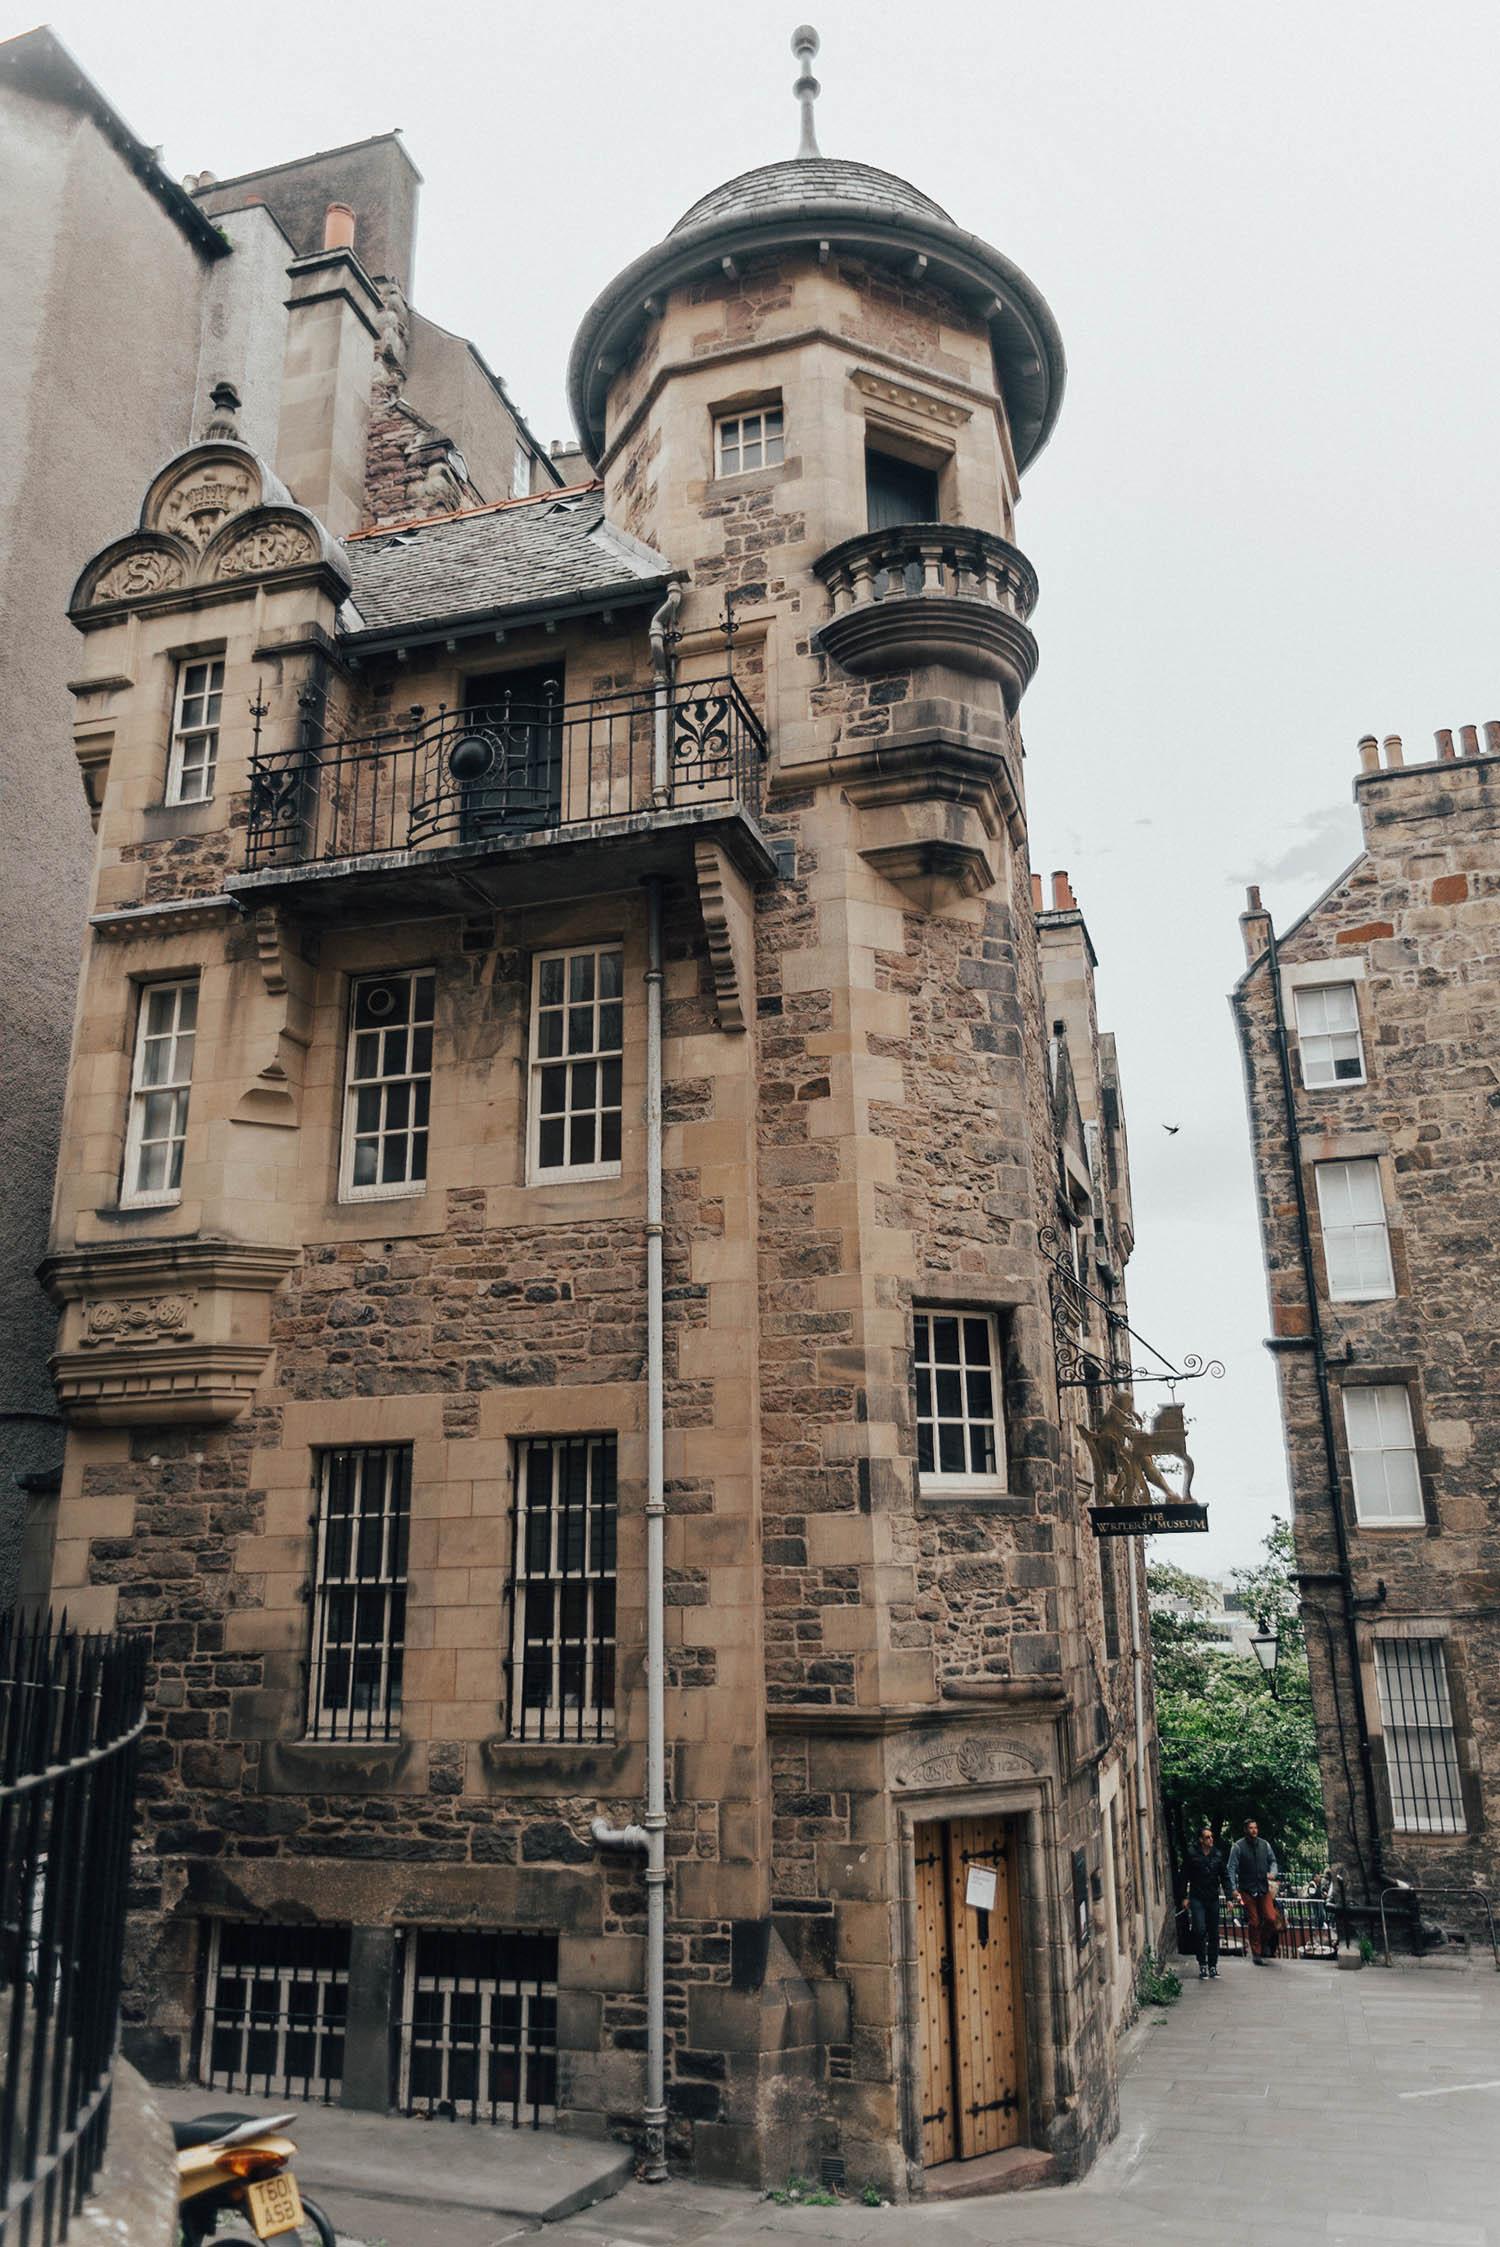 The Writer's Museum in Edinburgh